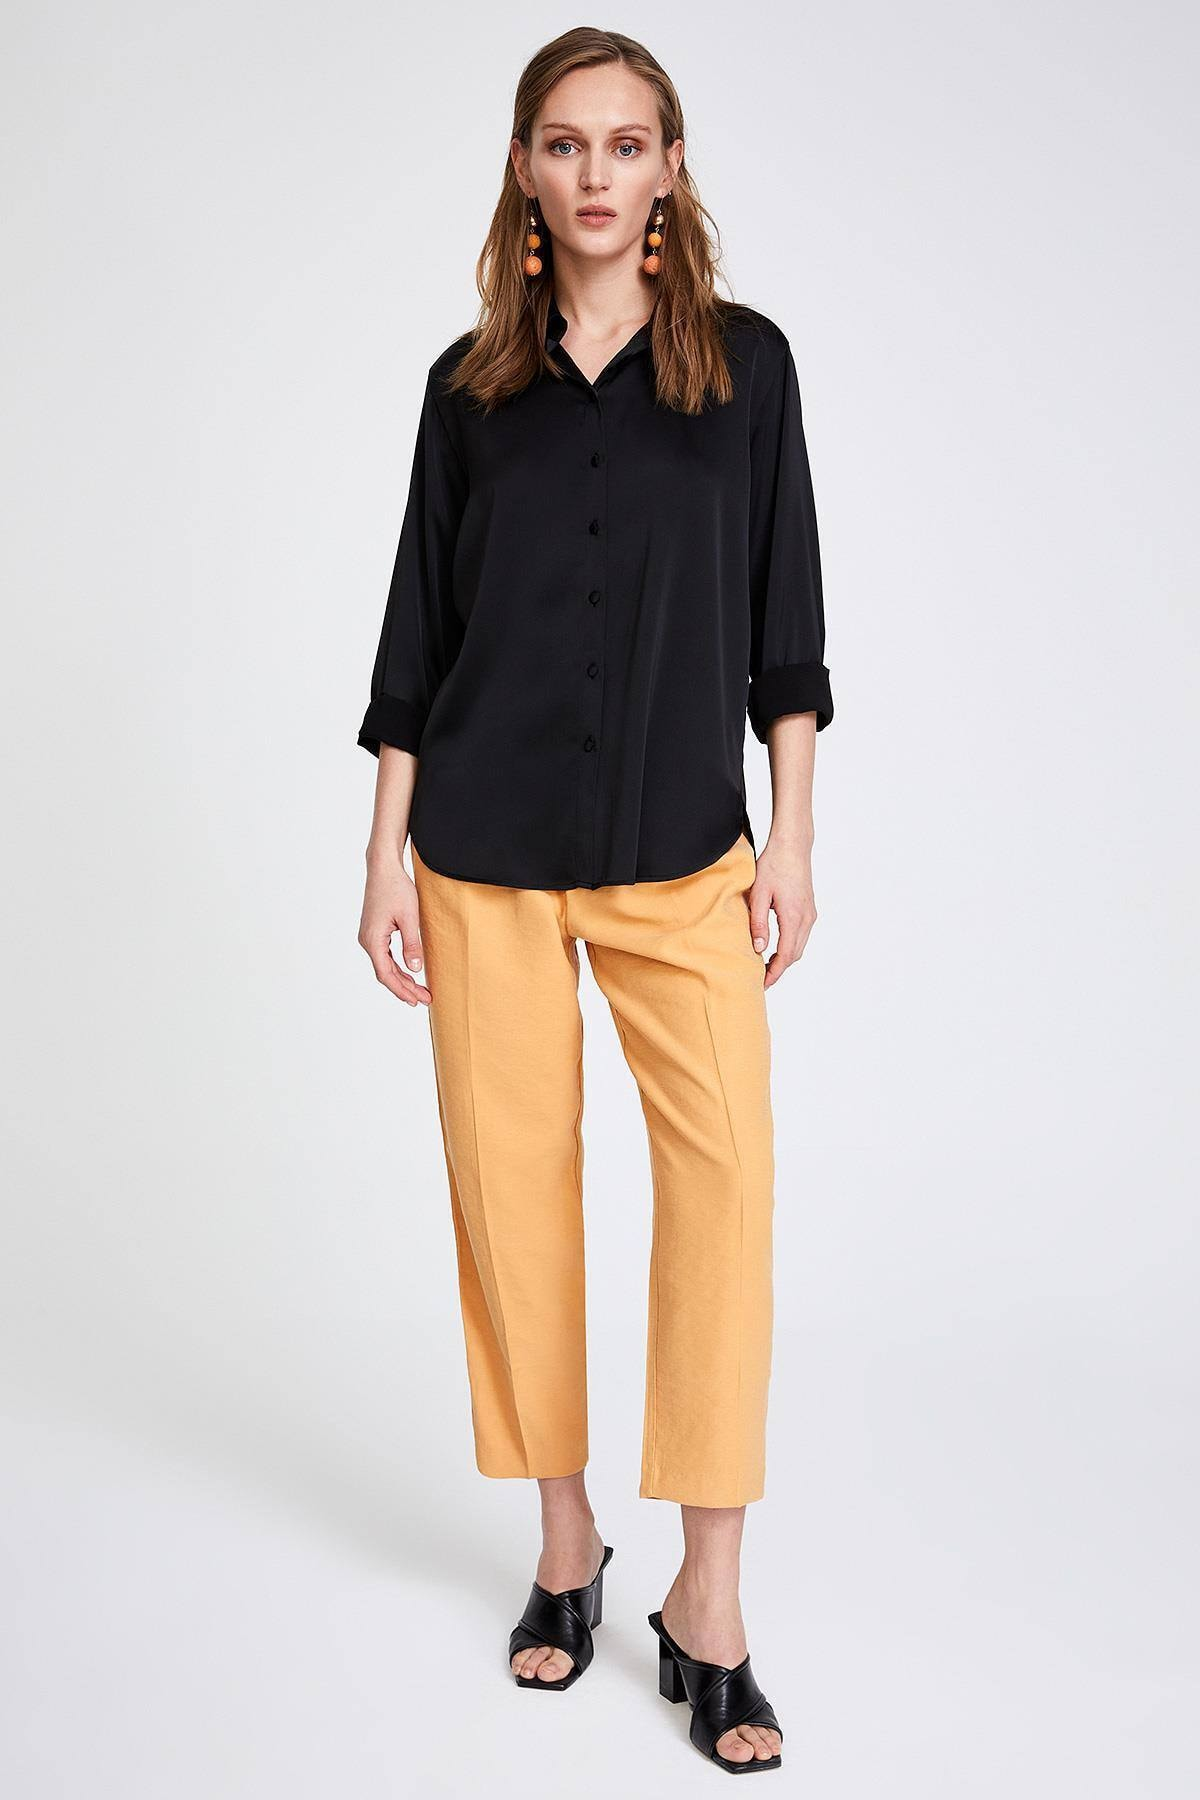 STELLA PULVIS Kadın Siyah Saten Gömlek 1